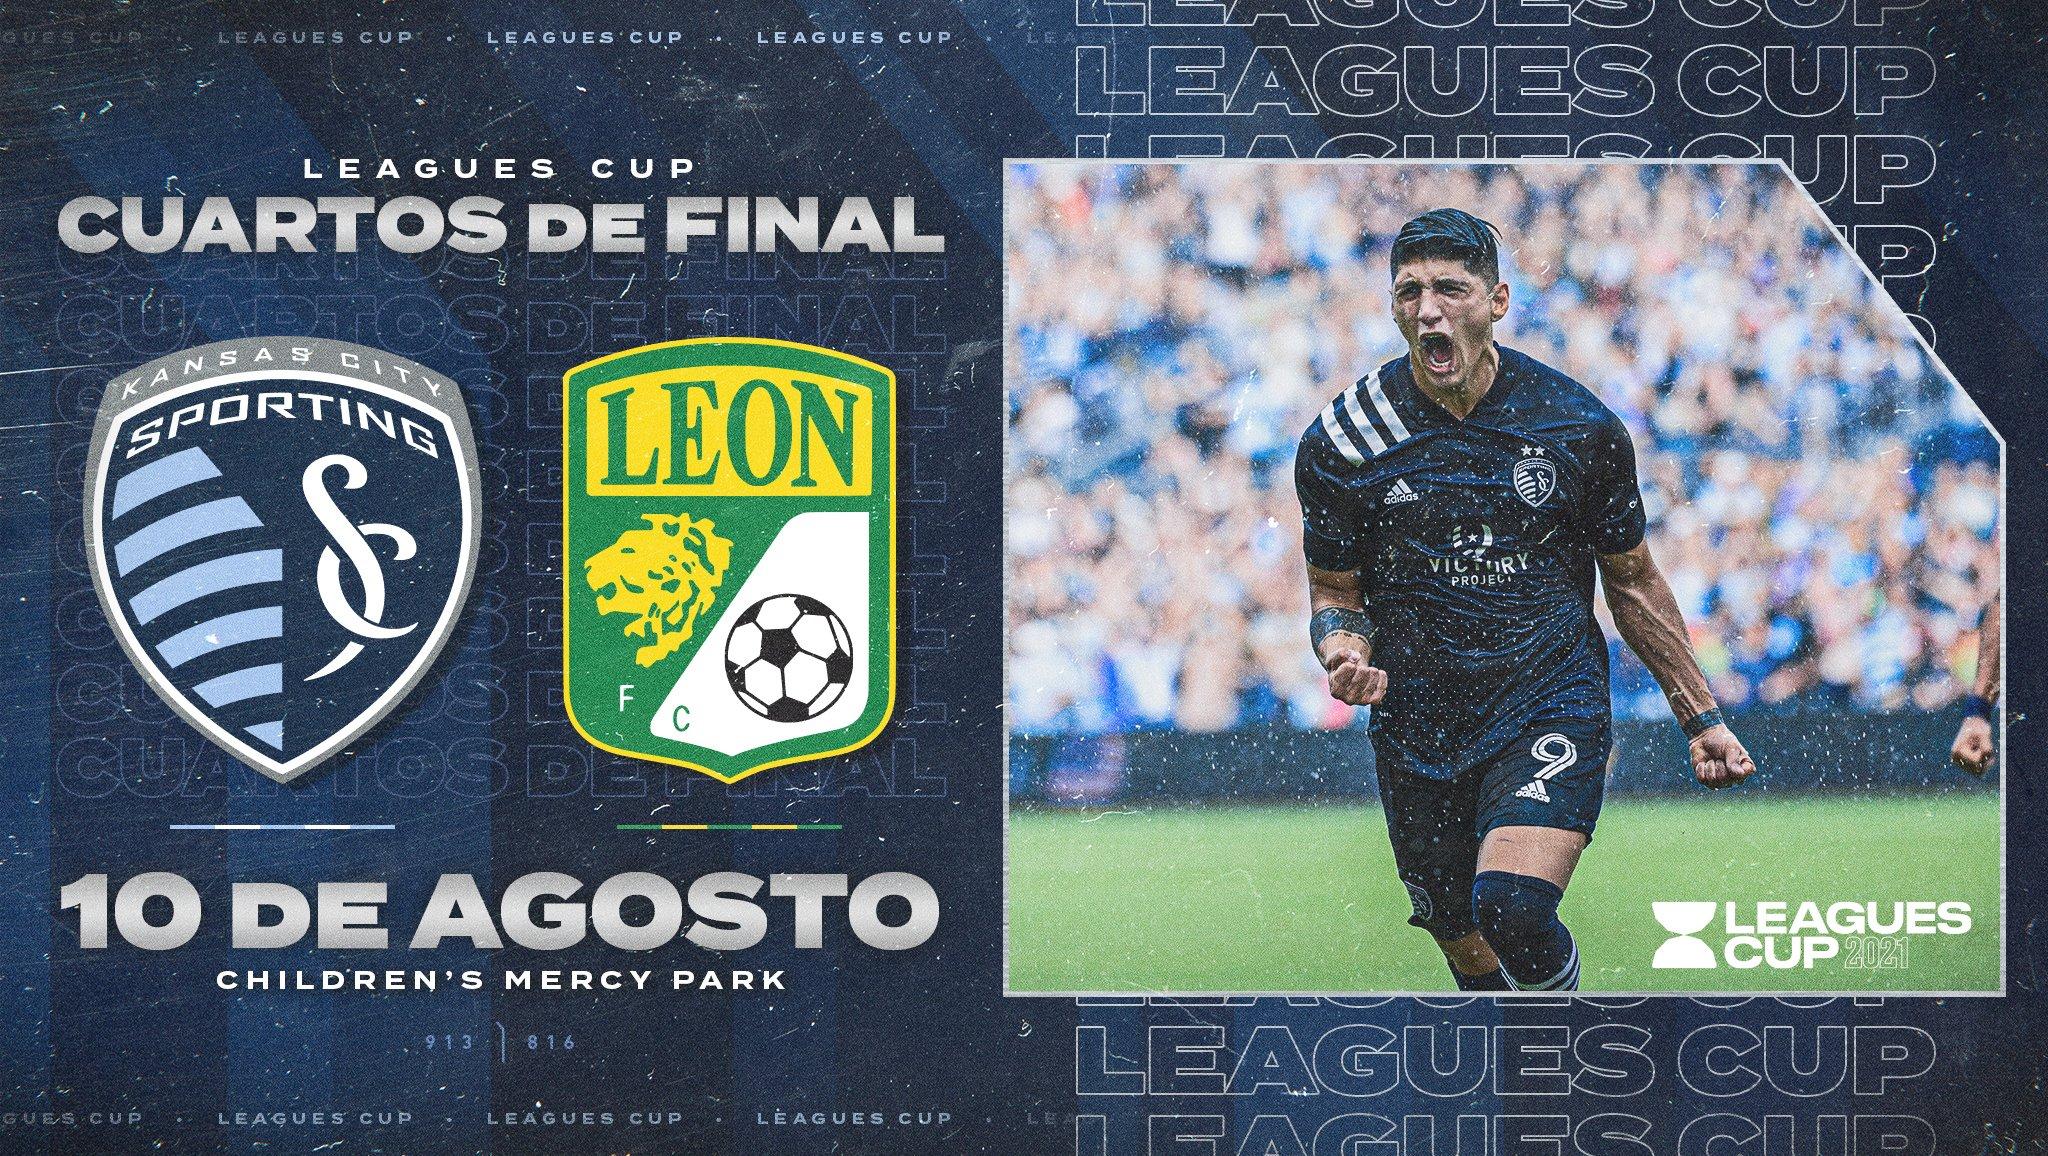 León vs Sporting Kansas City